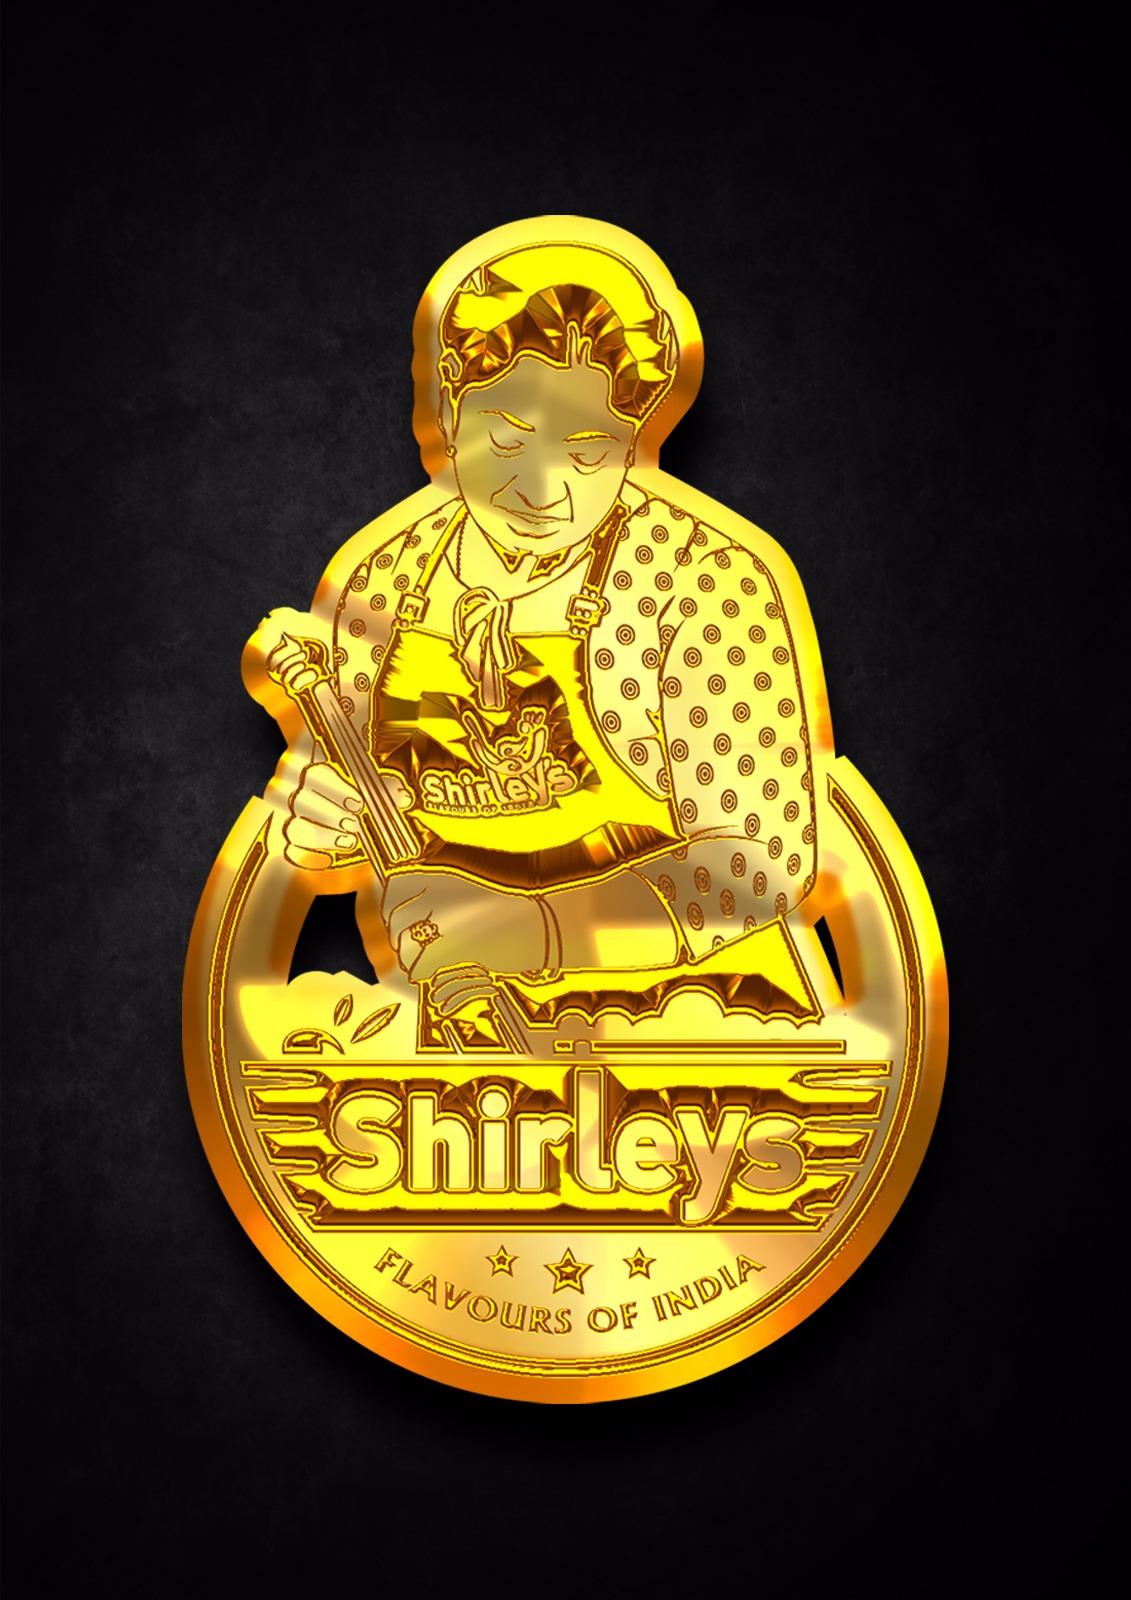 Shirley's Flavors of India Menu